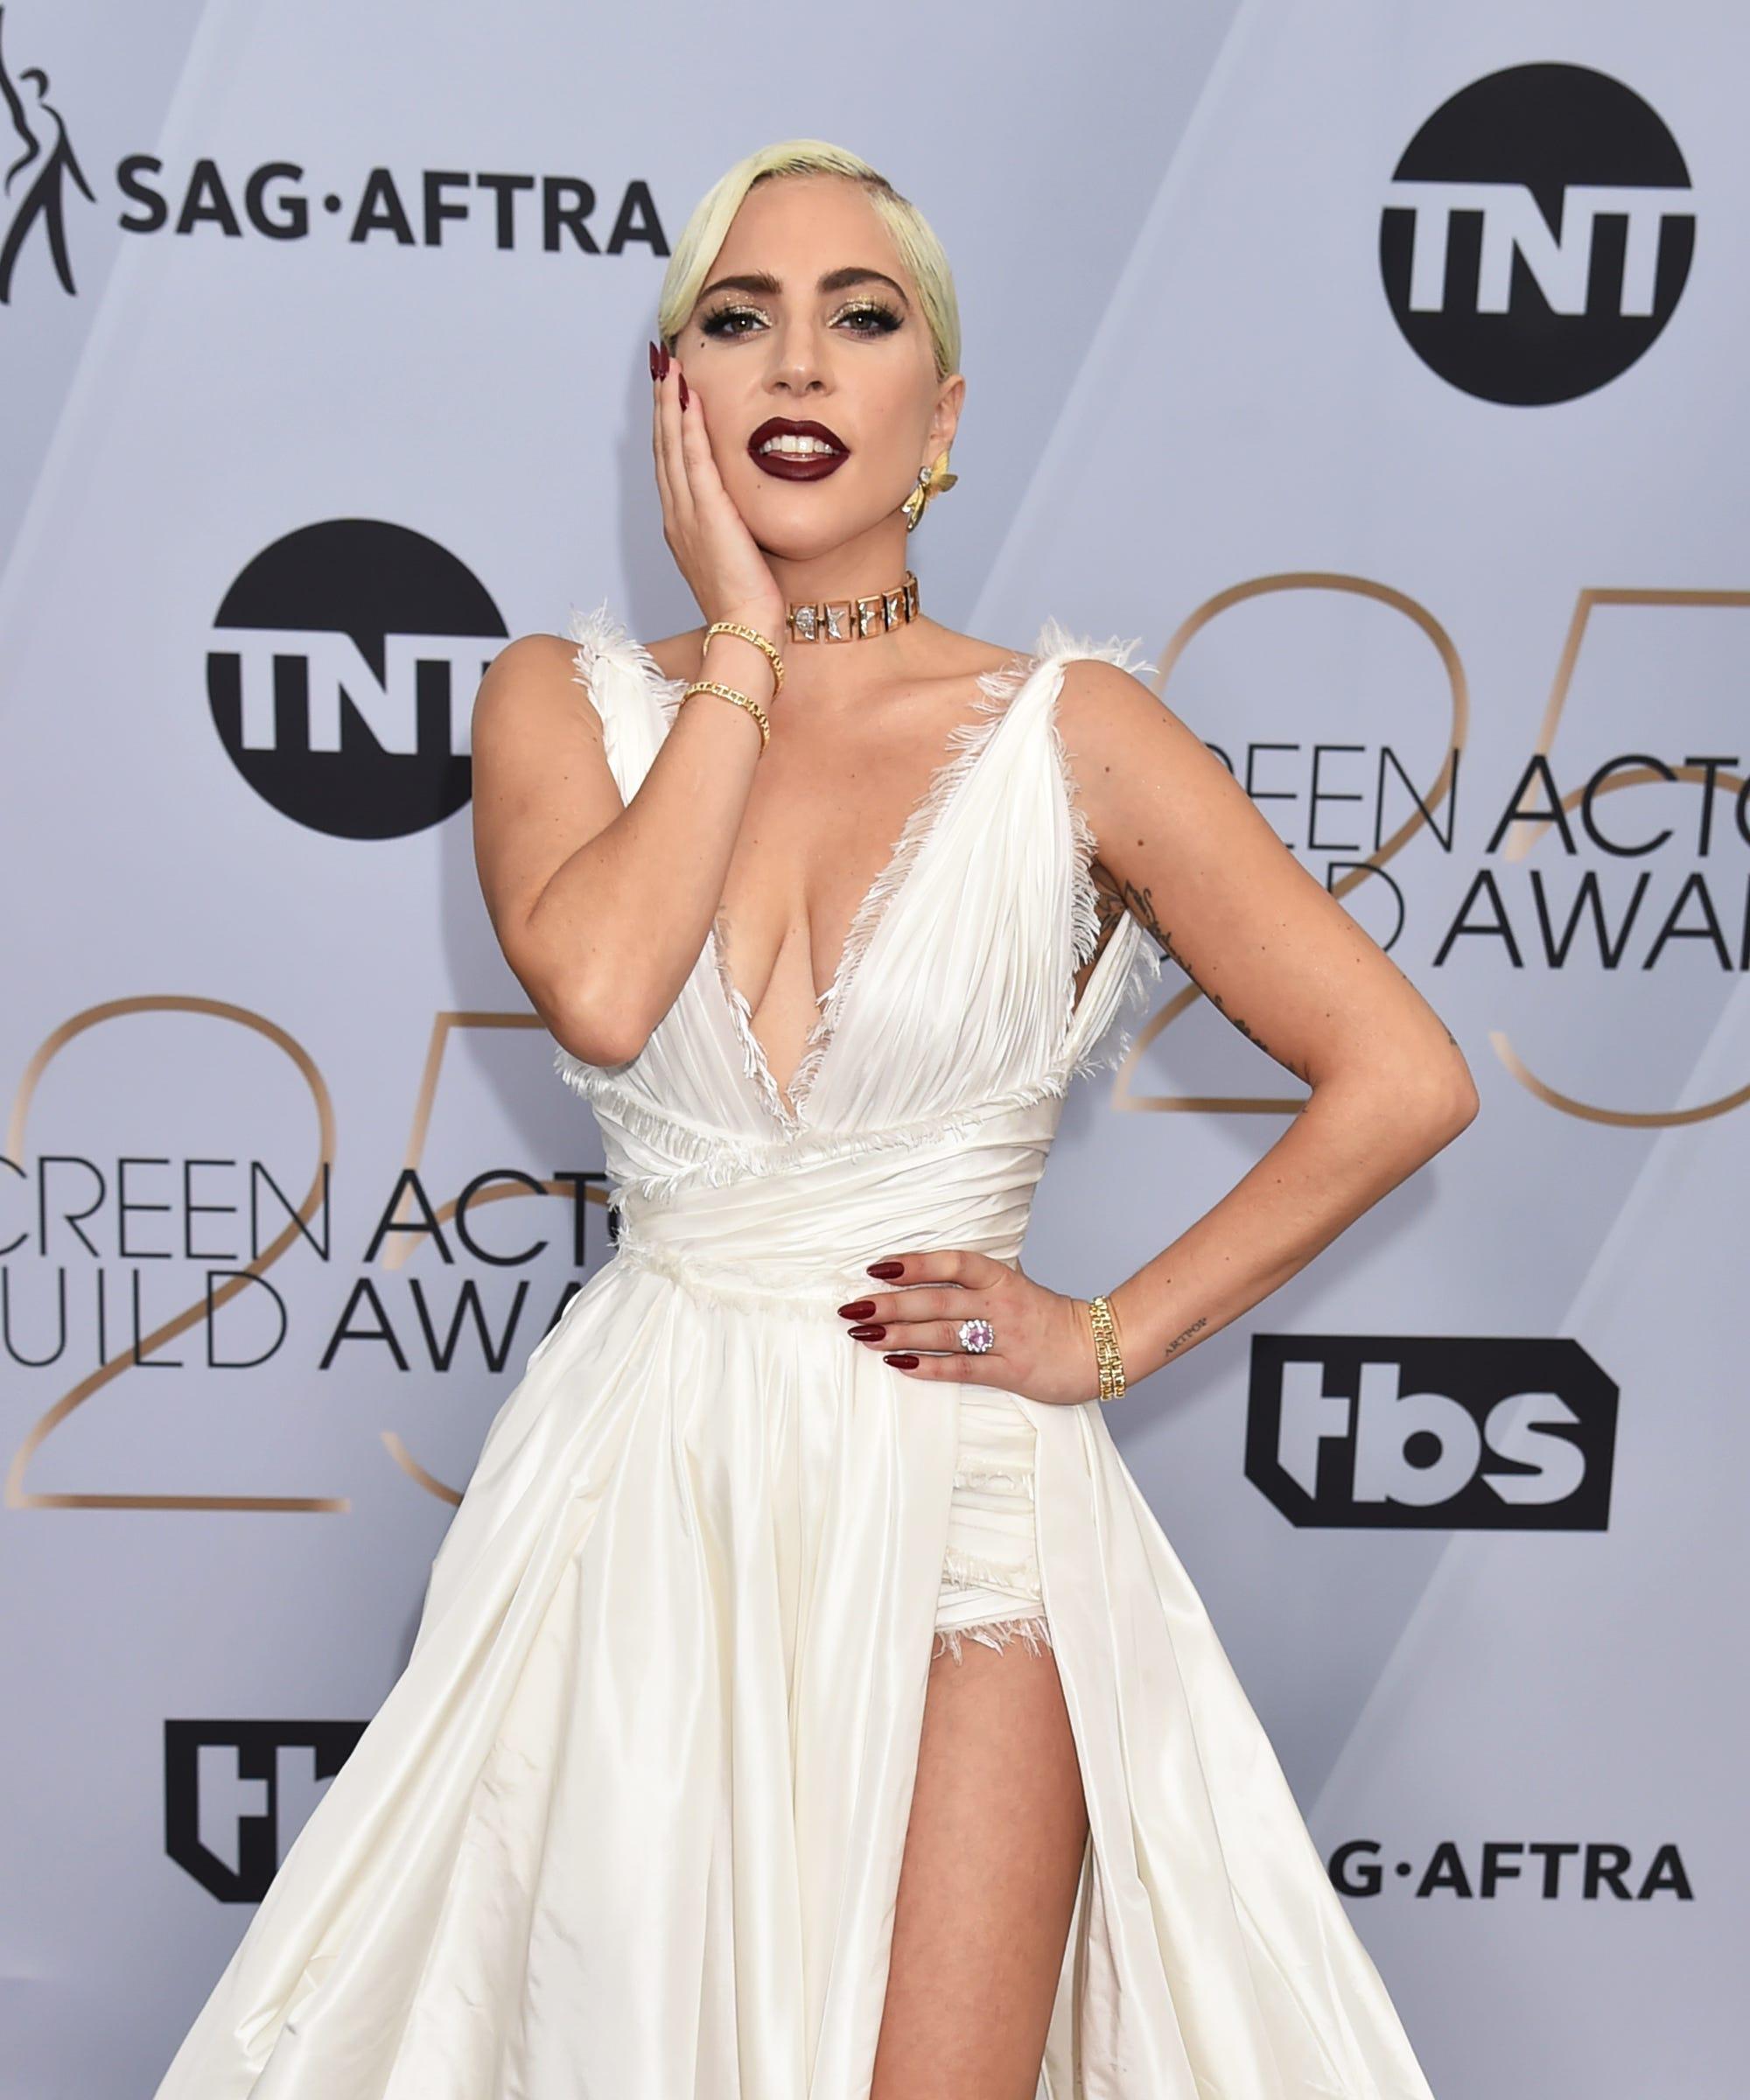 d318cc0aead Lady Gaga Sexy White Dress Wows All At 2019 SAG Awards